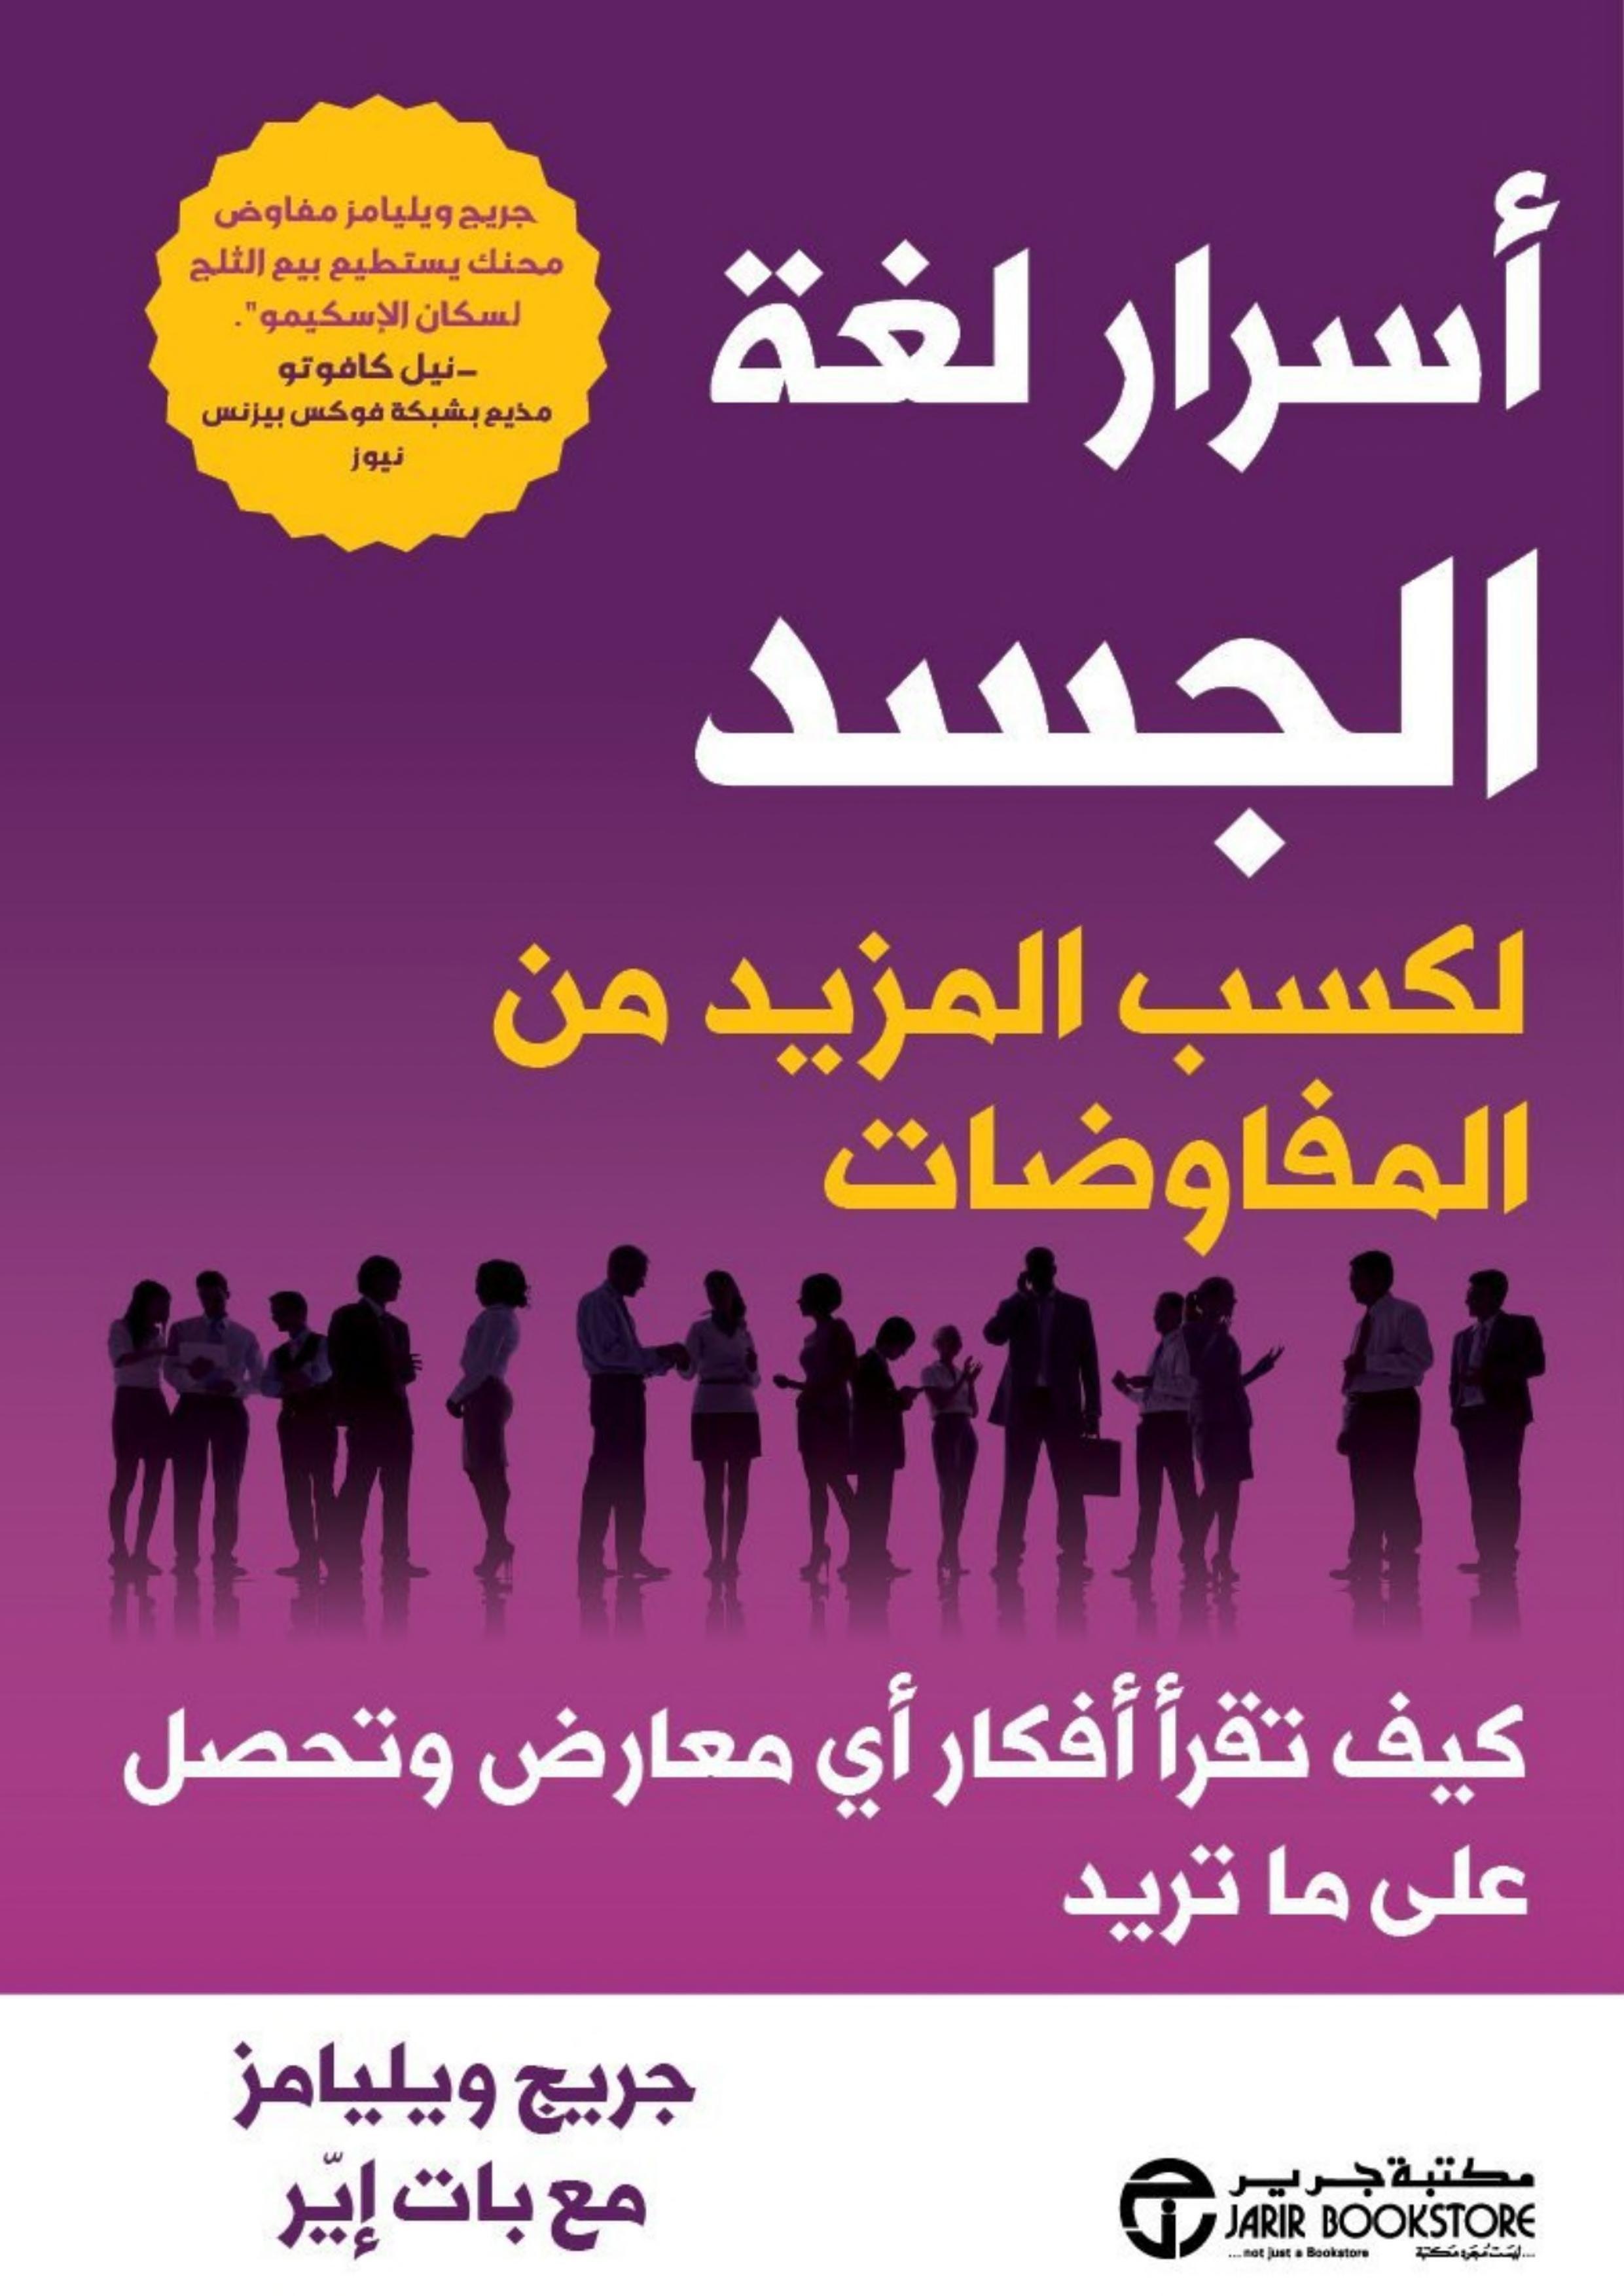 اسرار لغة الجسد Almaktbh Net Free Download Borrow And Streaming Internet Archive Pdf Books Reading Psychology Books Philosophy Books